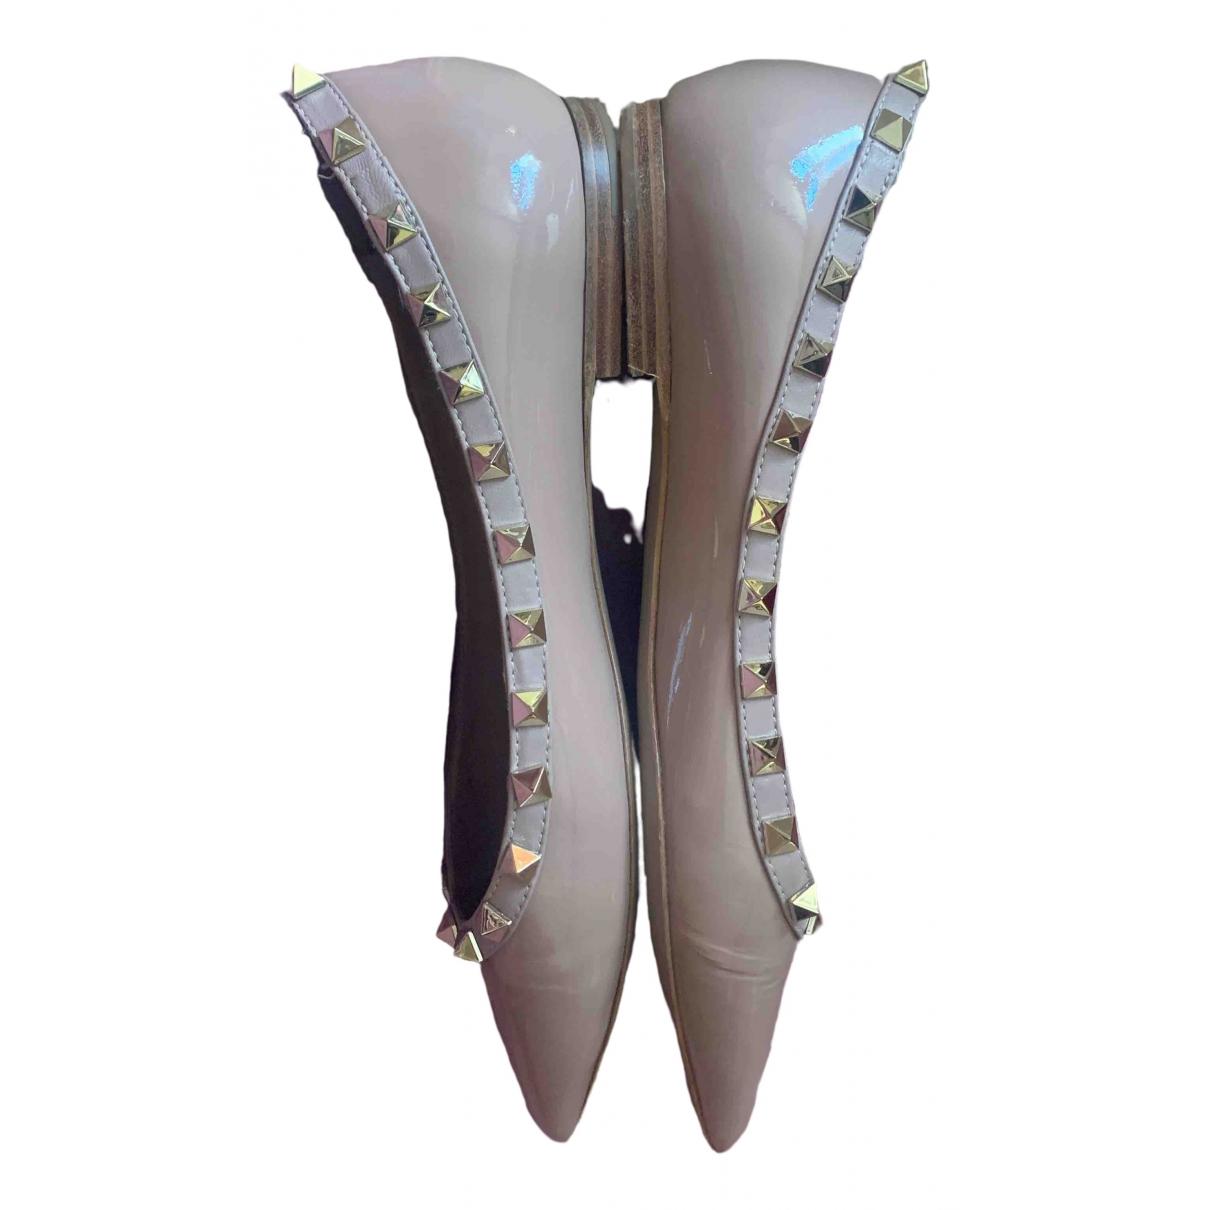 Valentino Garavani Rockstud Beige Patent leather Ballet flats for Women 39 EU